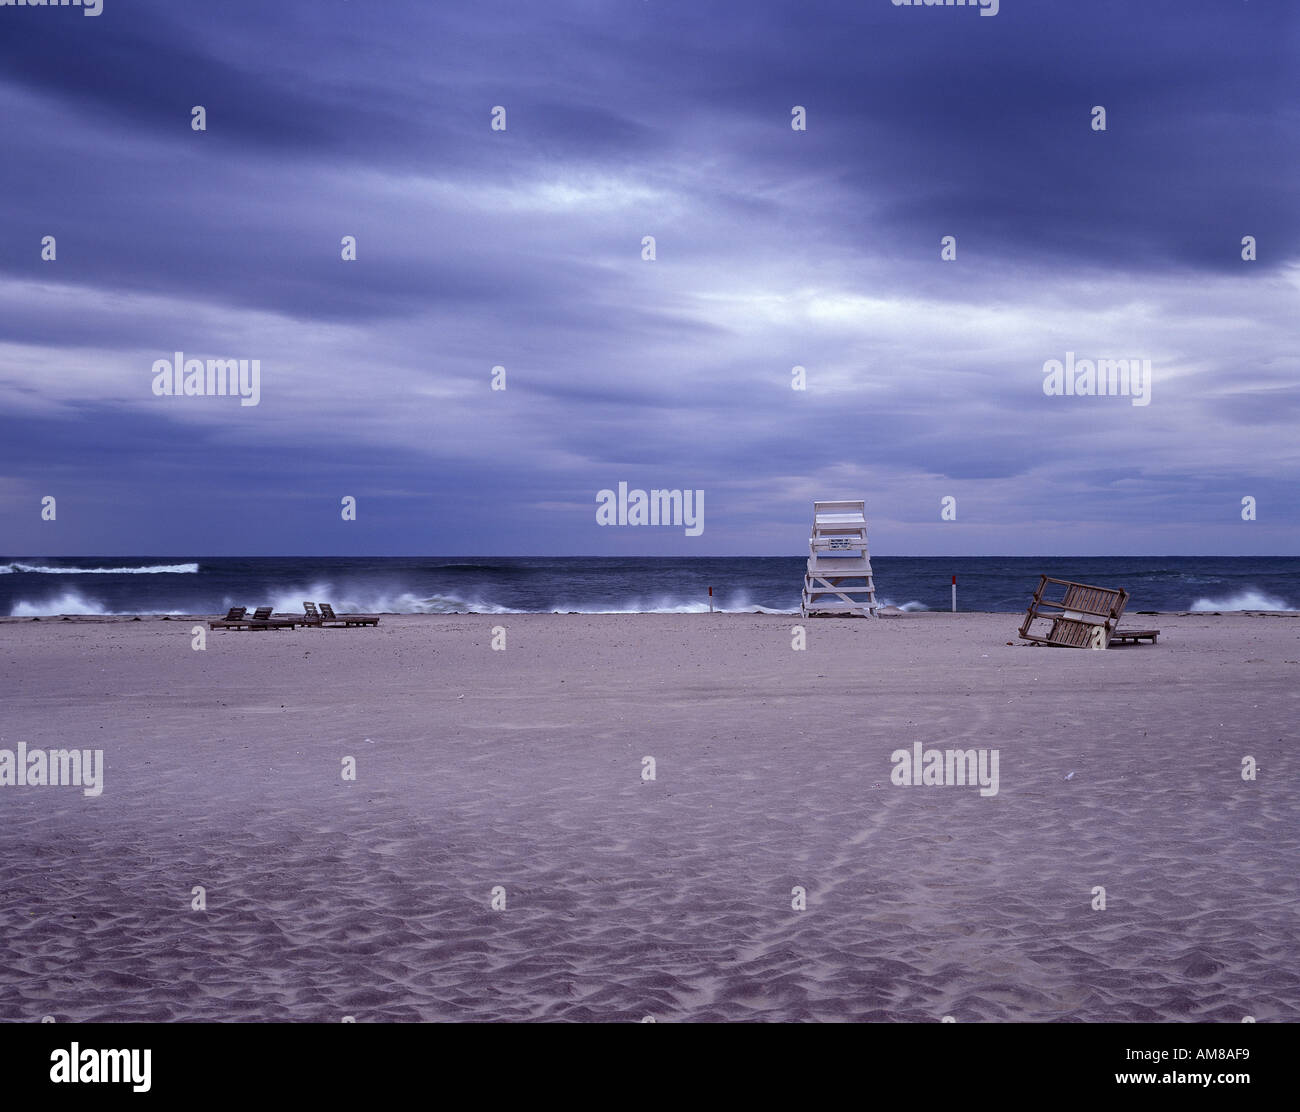 Empty beach during storm, Hamptons Beach, Long Island, New York, USA - Stock Image